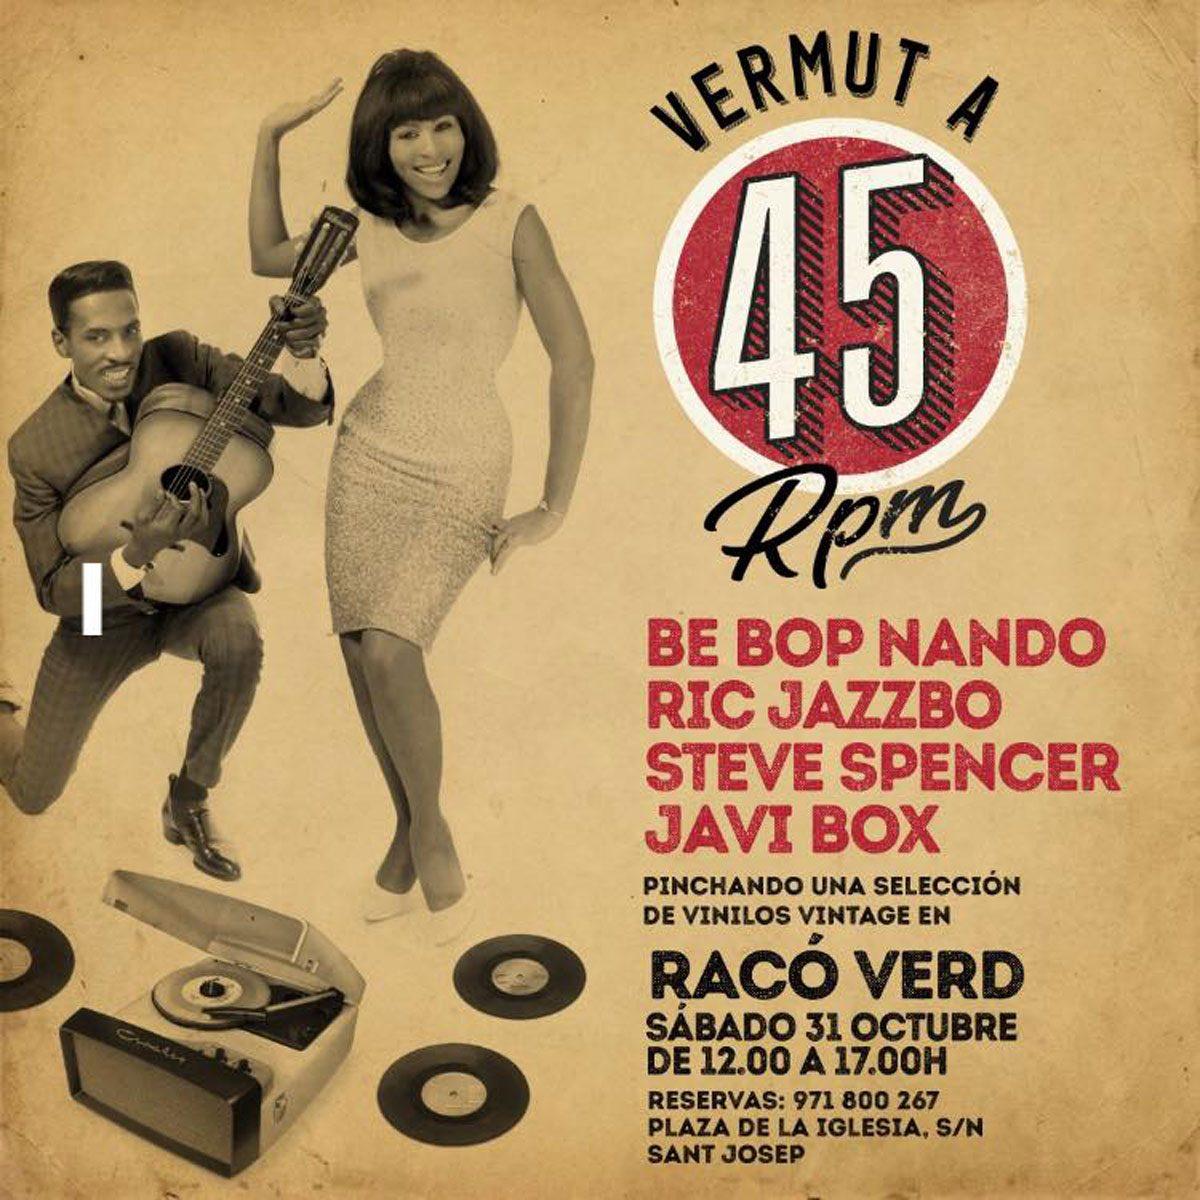 vermut-a-45-rpm-raco-verd-ibiza-2020-welcometoibiza